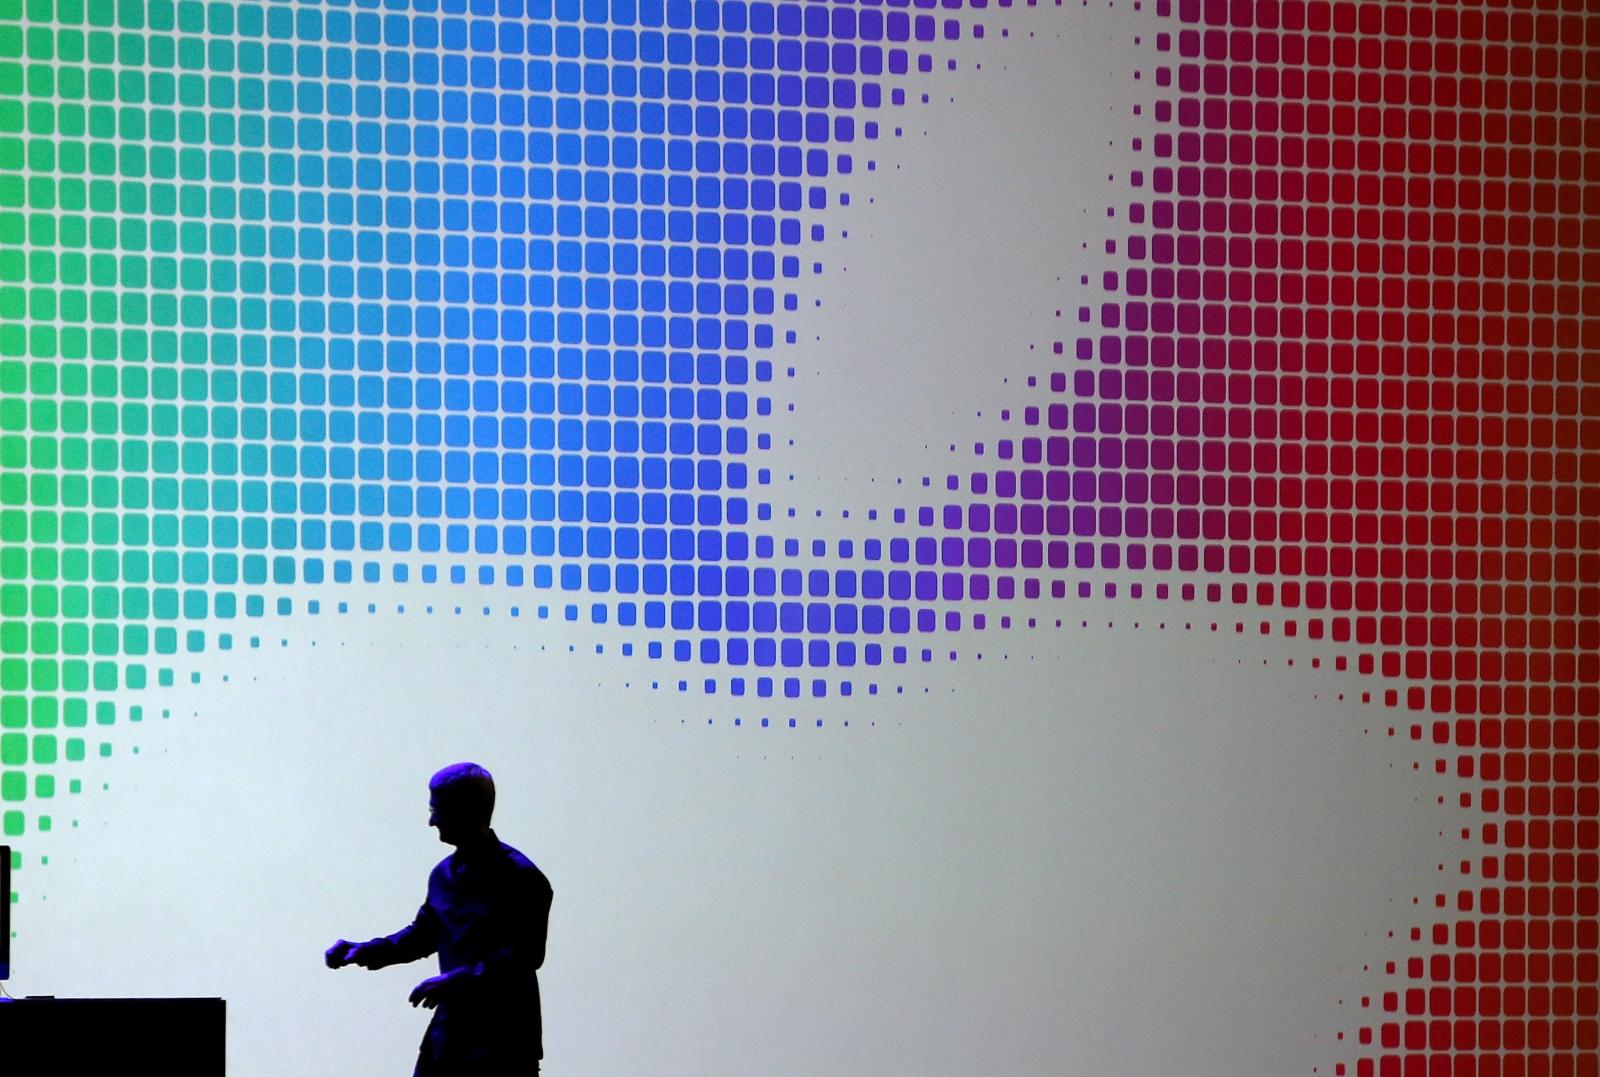 Apple releases iOS 9.3.5